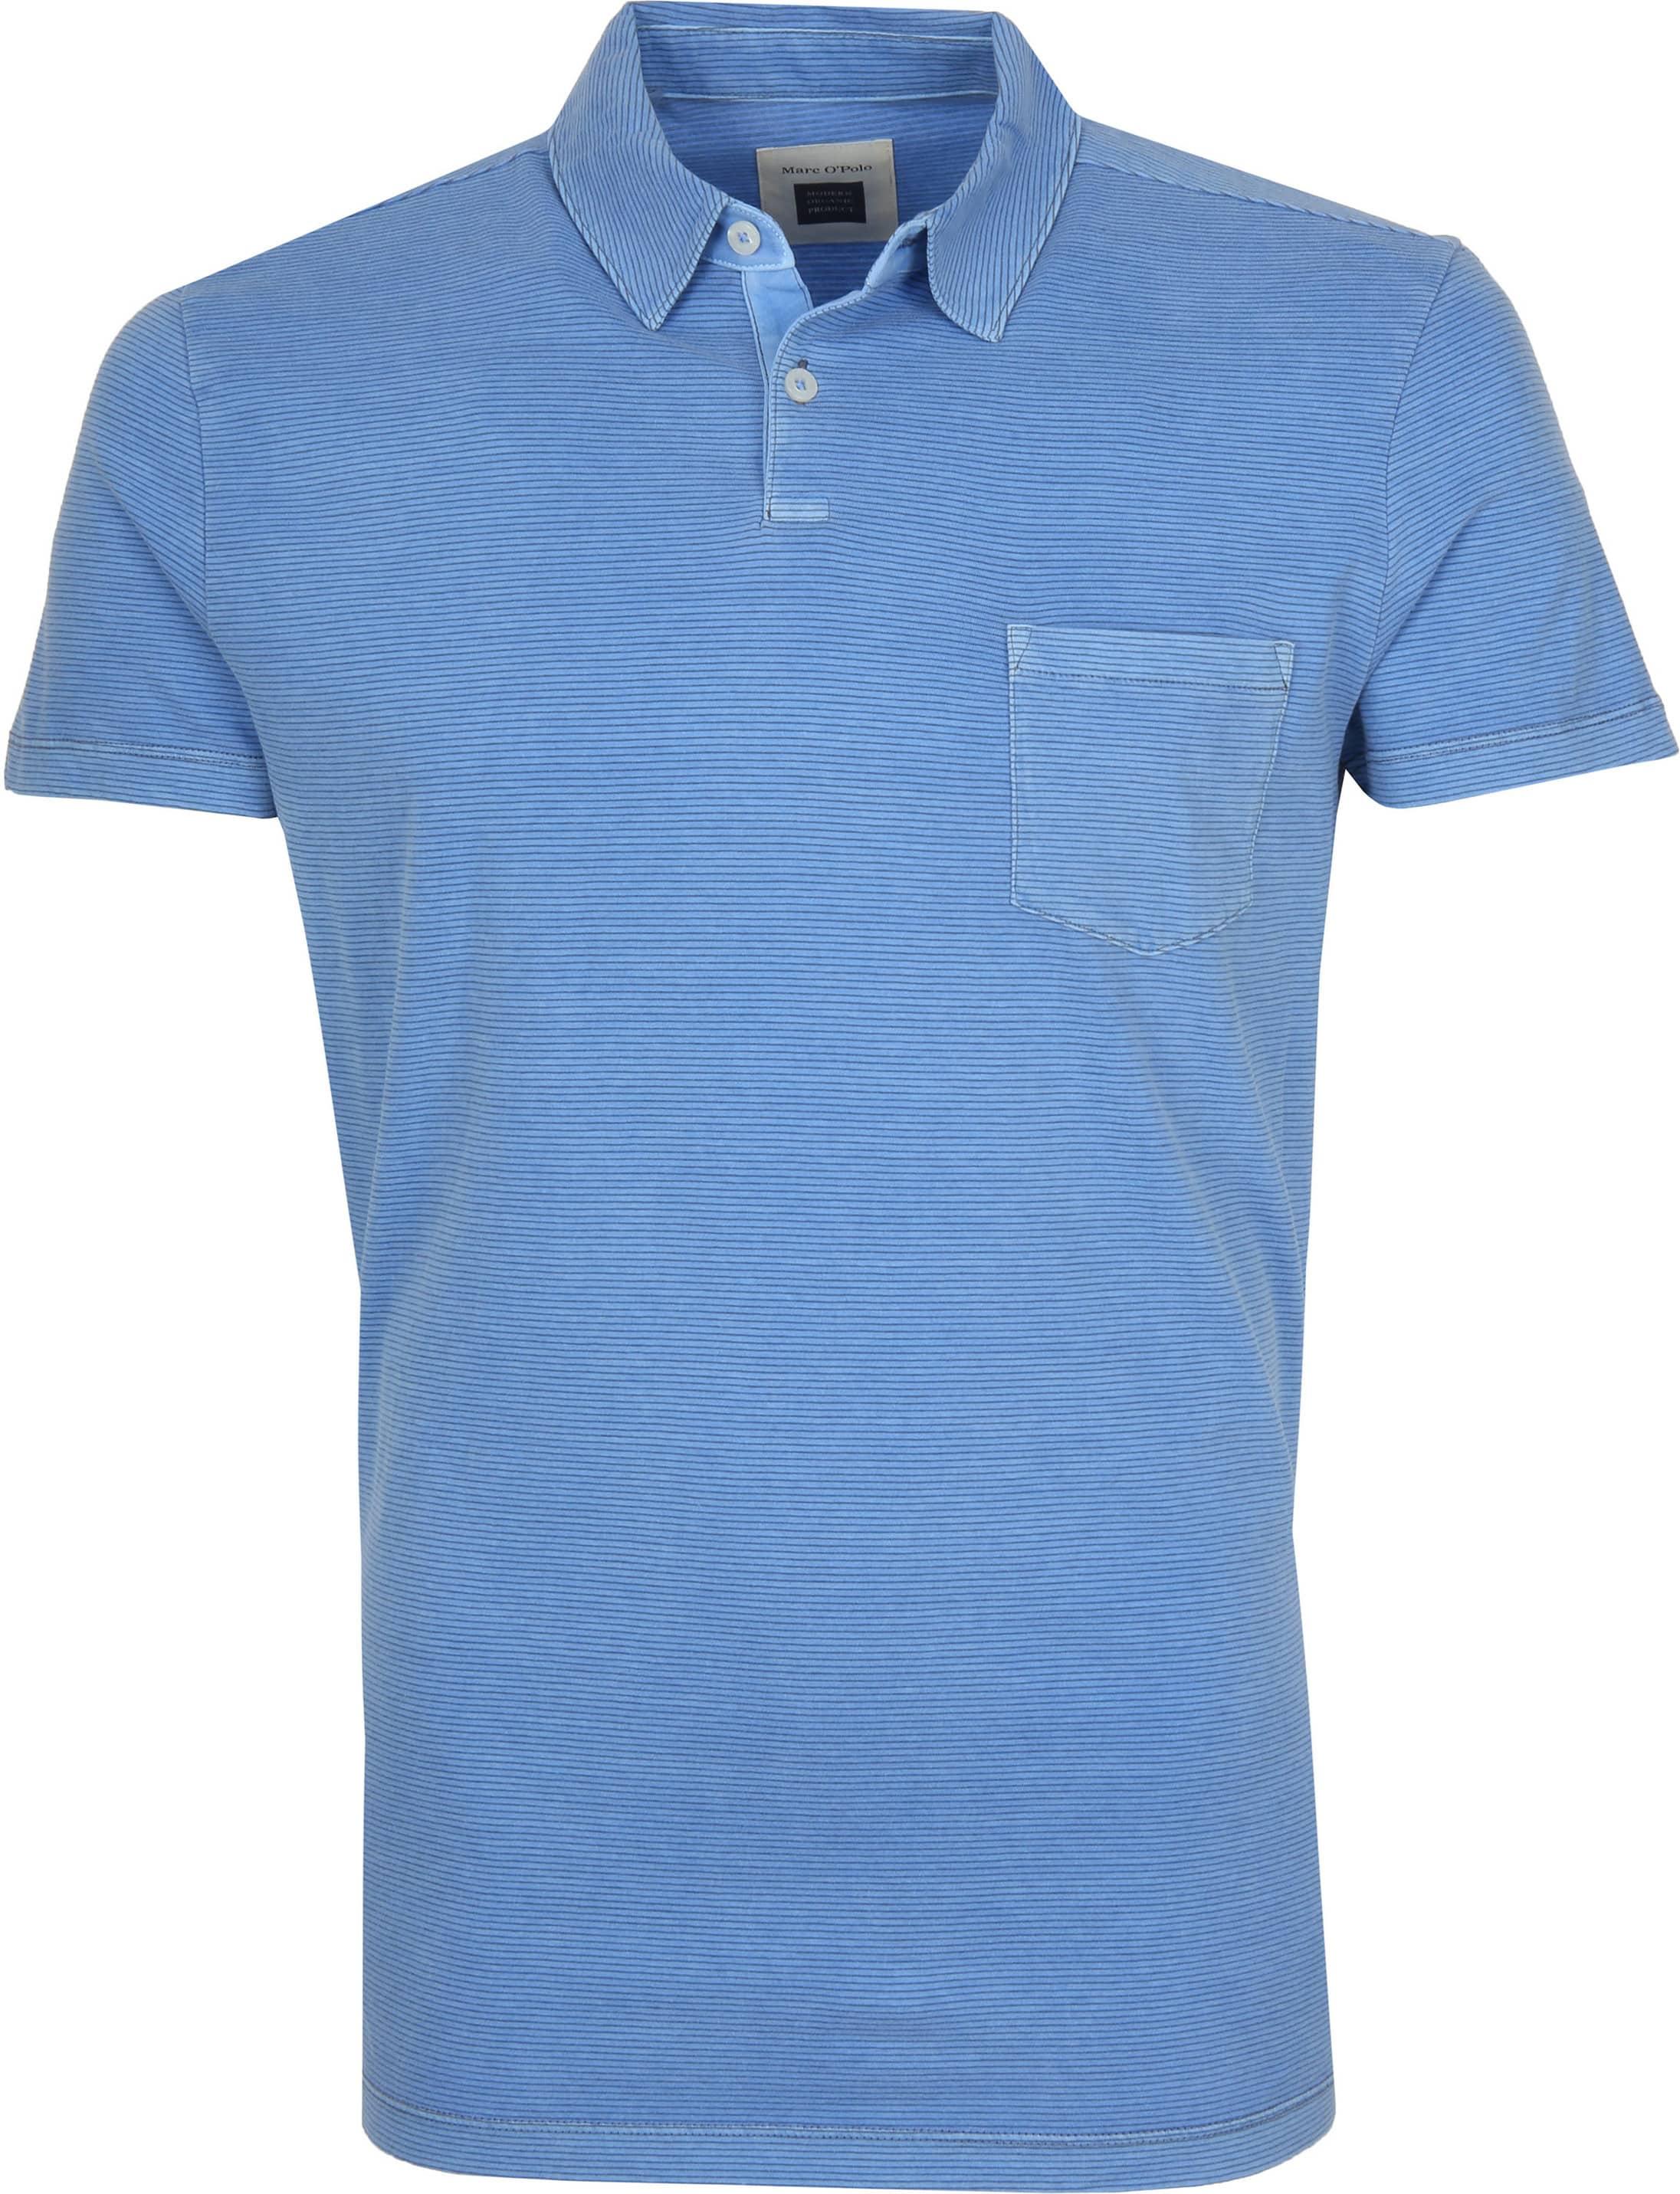 Marc O'Polo Poloshirt Riviera Blauw